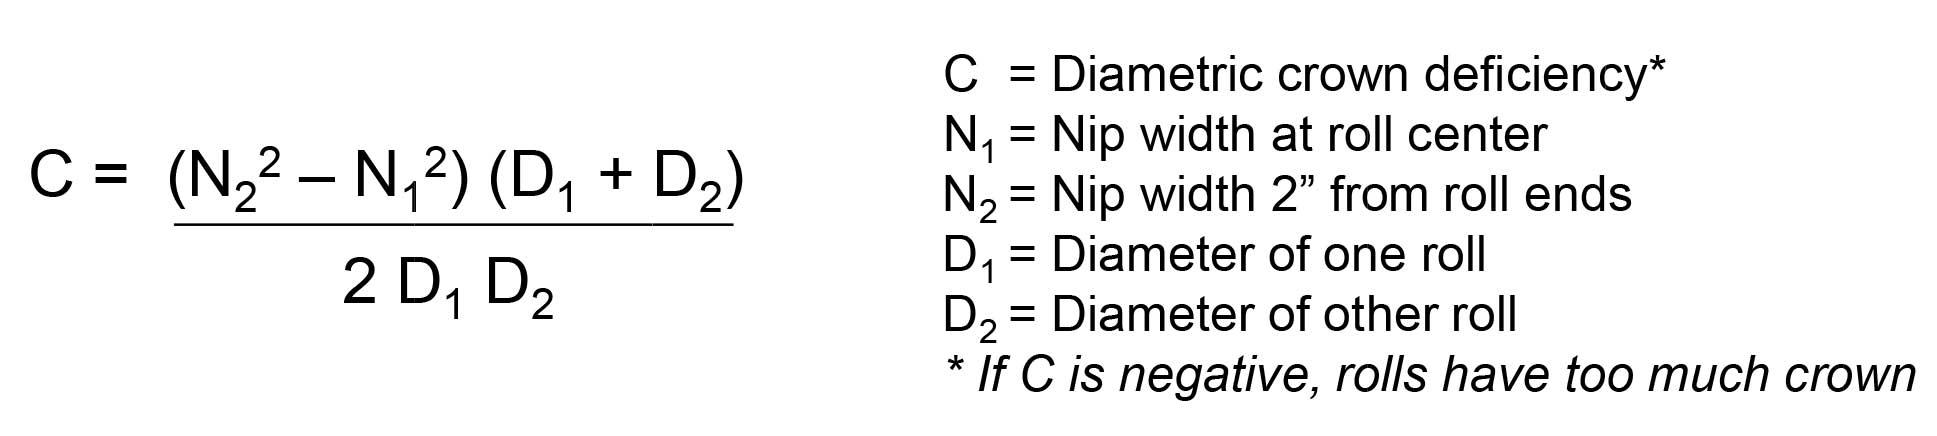 Nip impression fujifilm prescale surface pressure distribution equation 1 crown calculation using nip widths and roll diameters sciox Choice Image